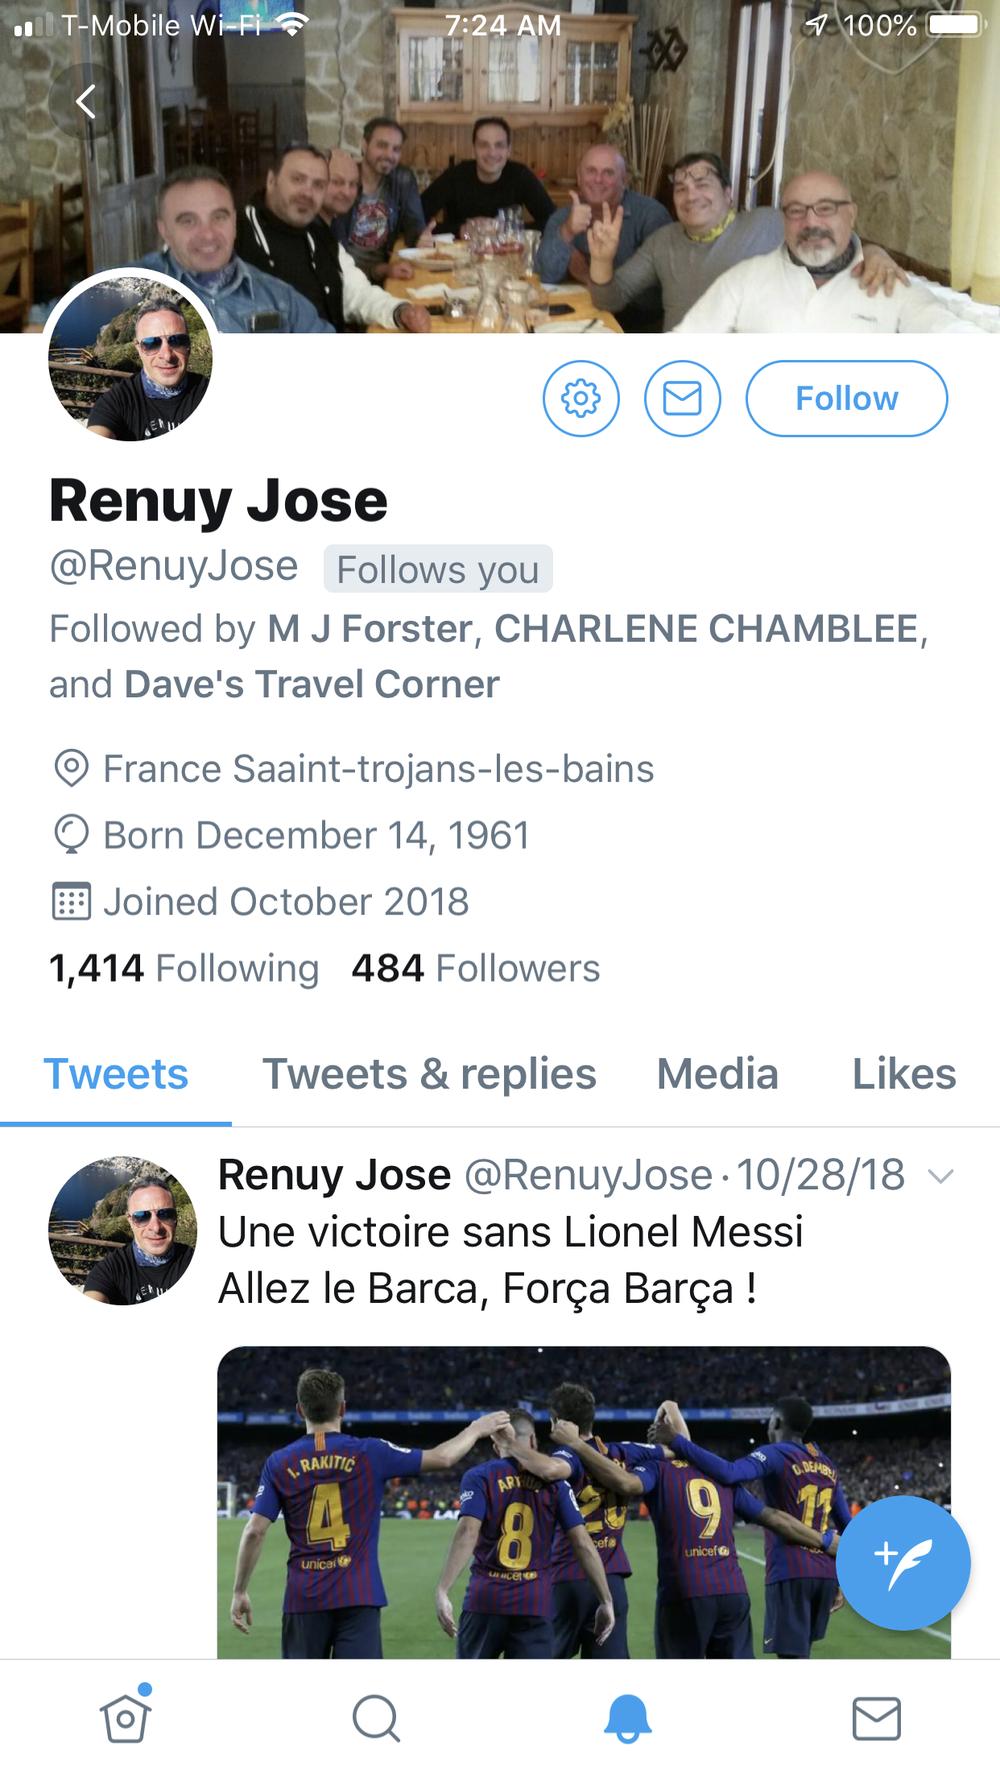 Renuy Jose